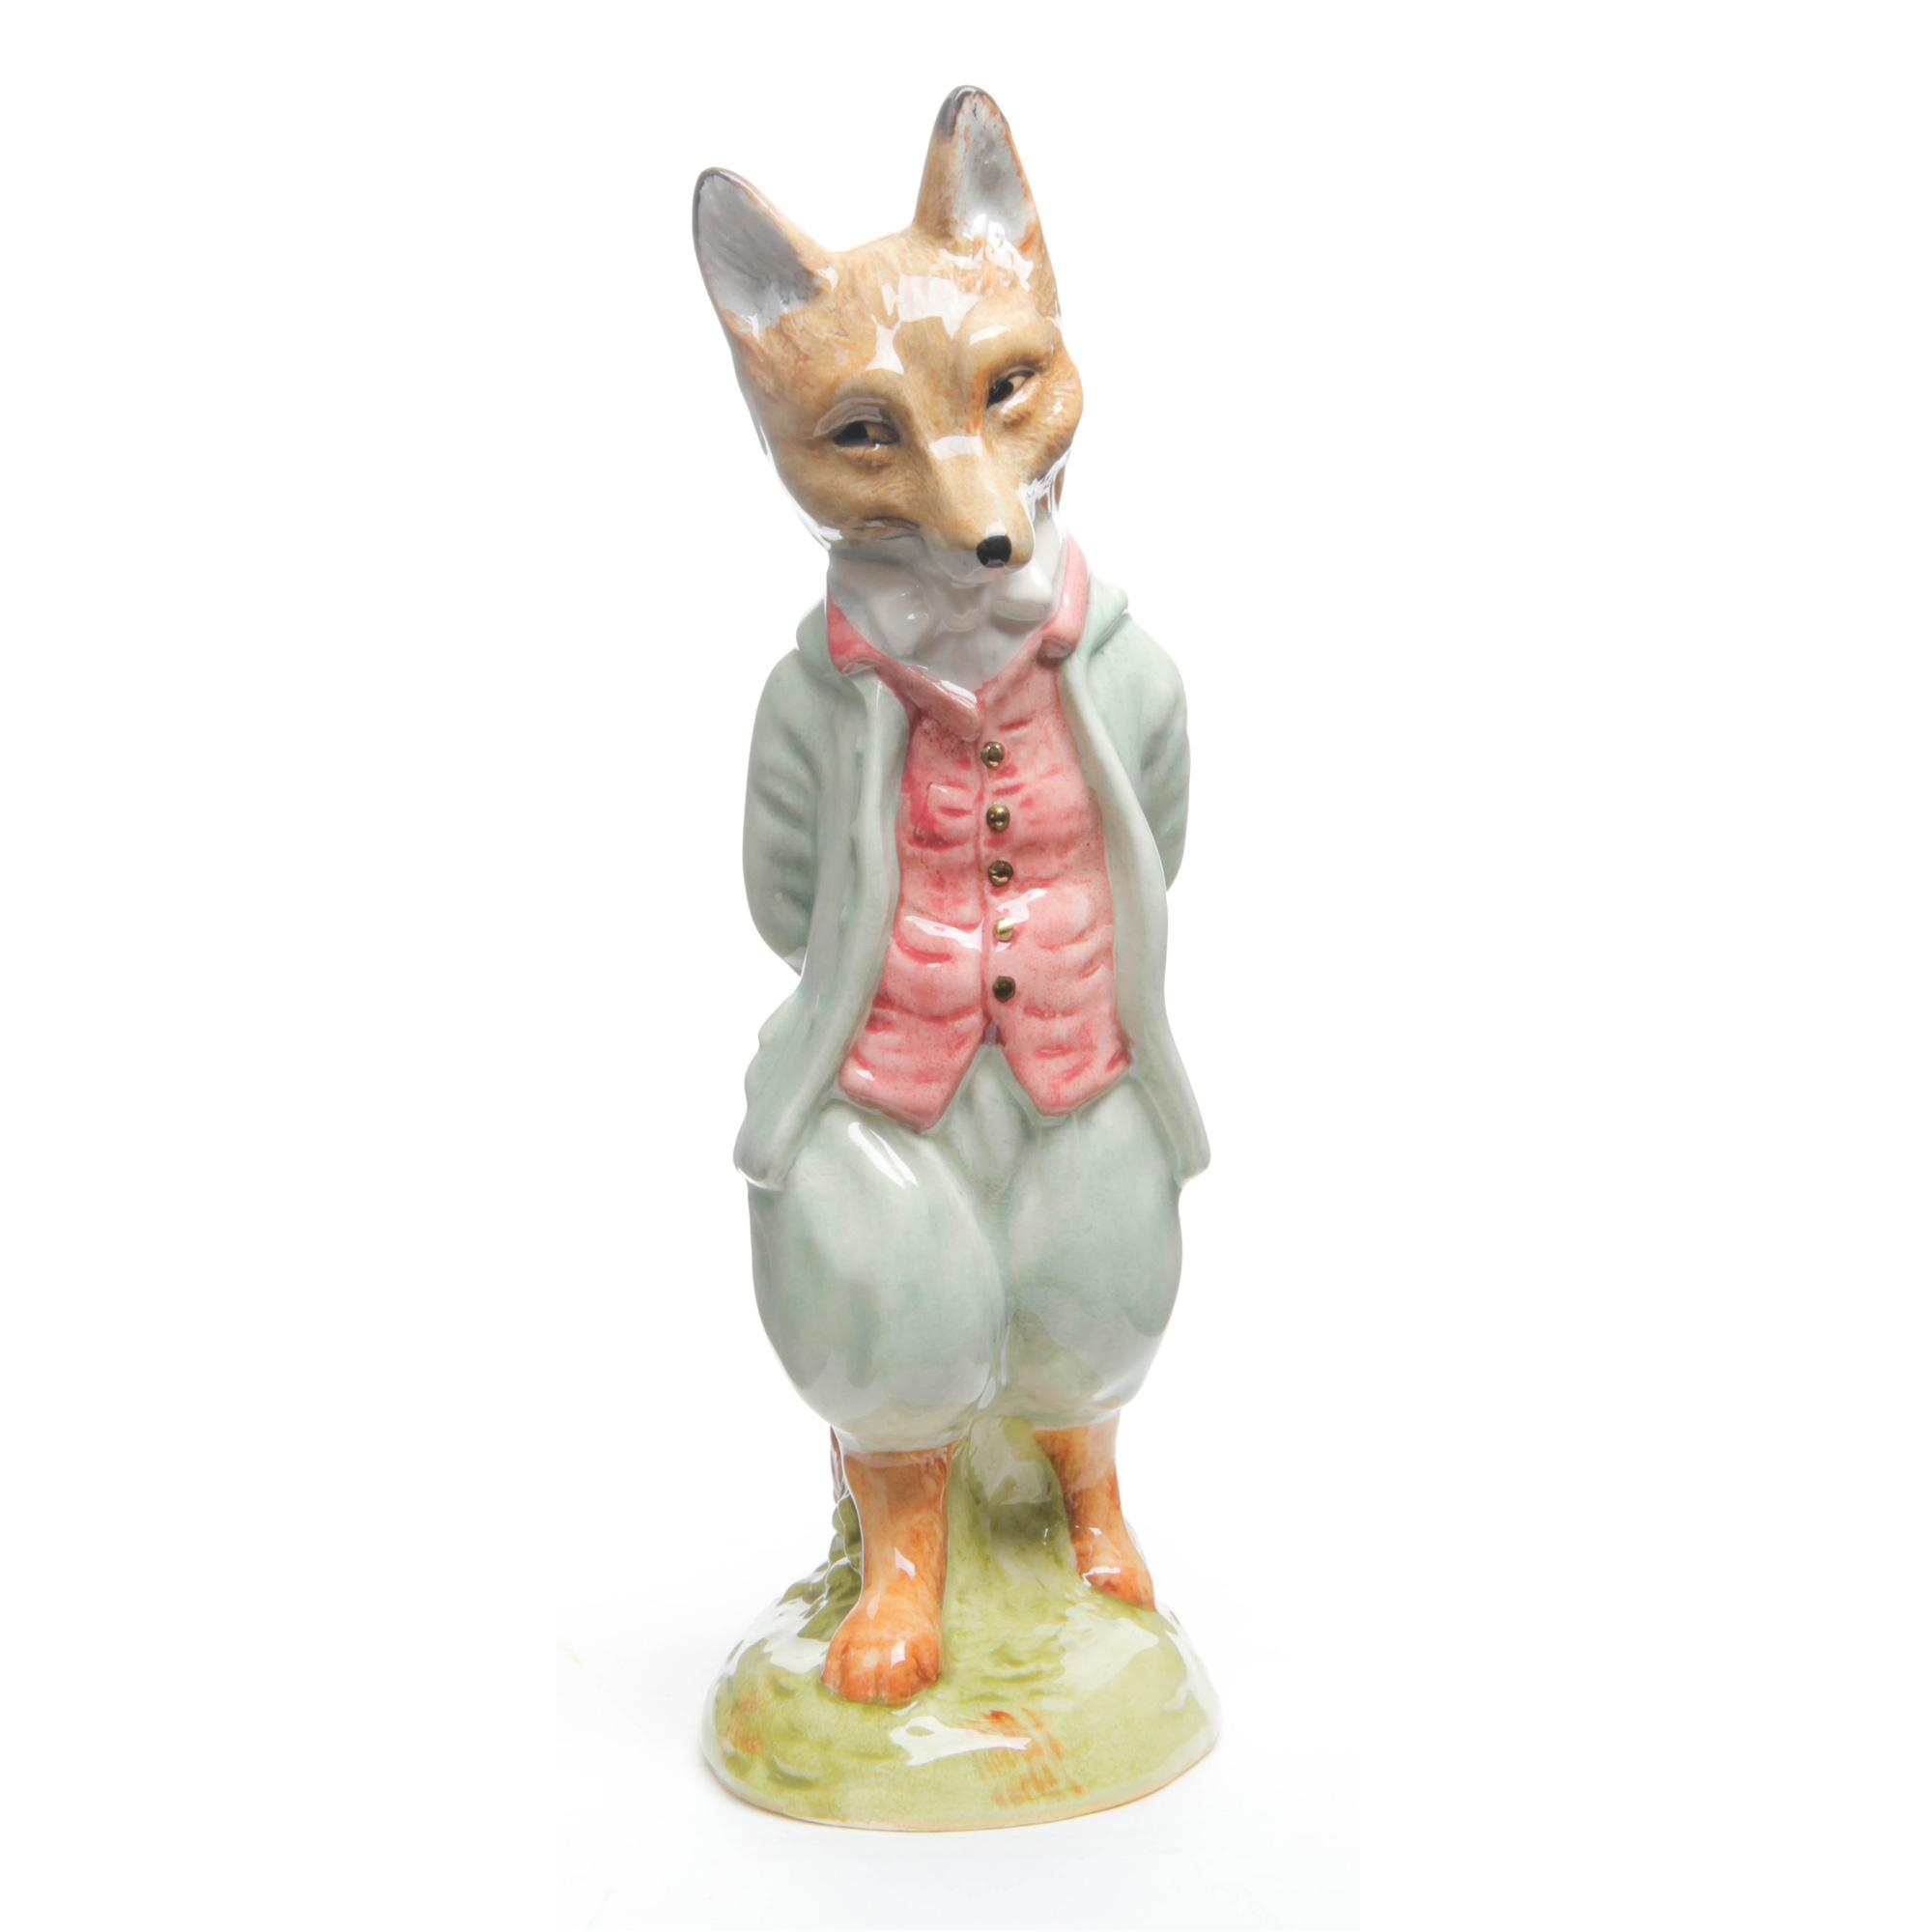 Foxy Whiskered Gentleman Large - Beatrix Potter Figure